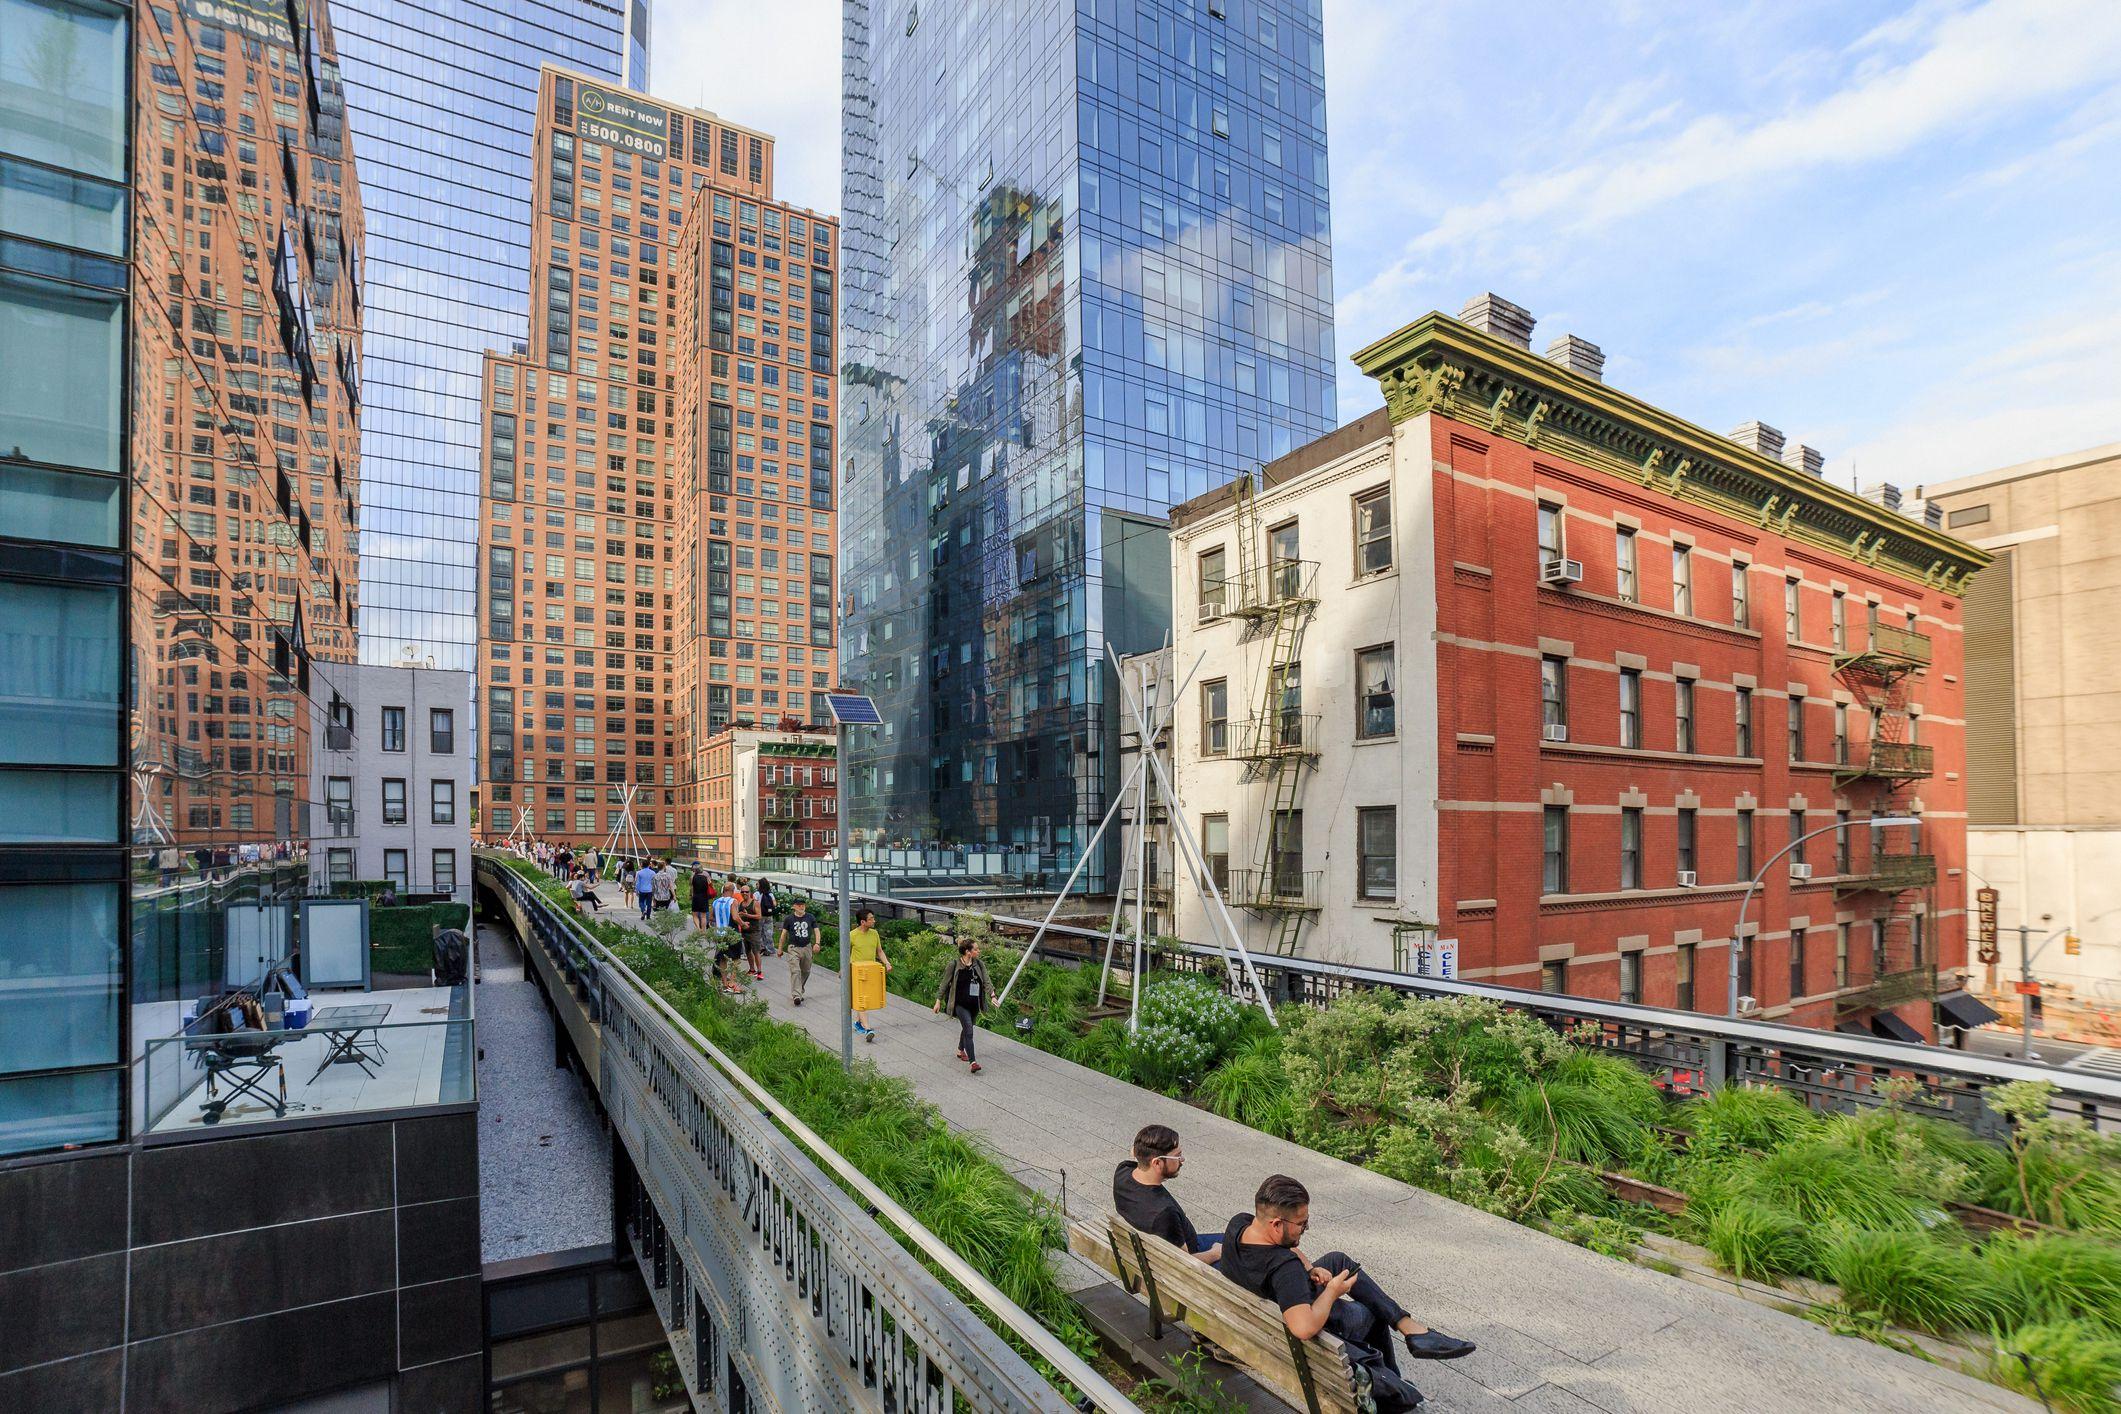 New York City High Line Park, Chelsea, Manhattan